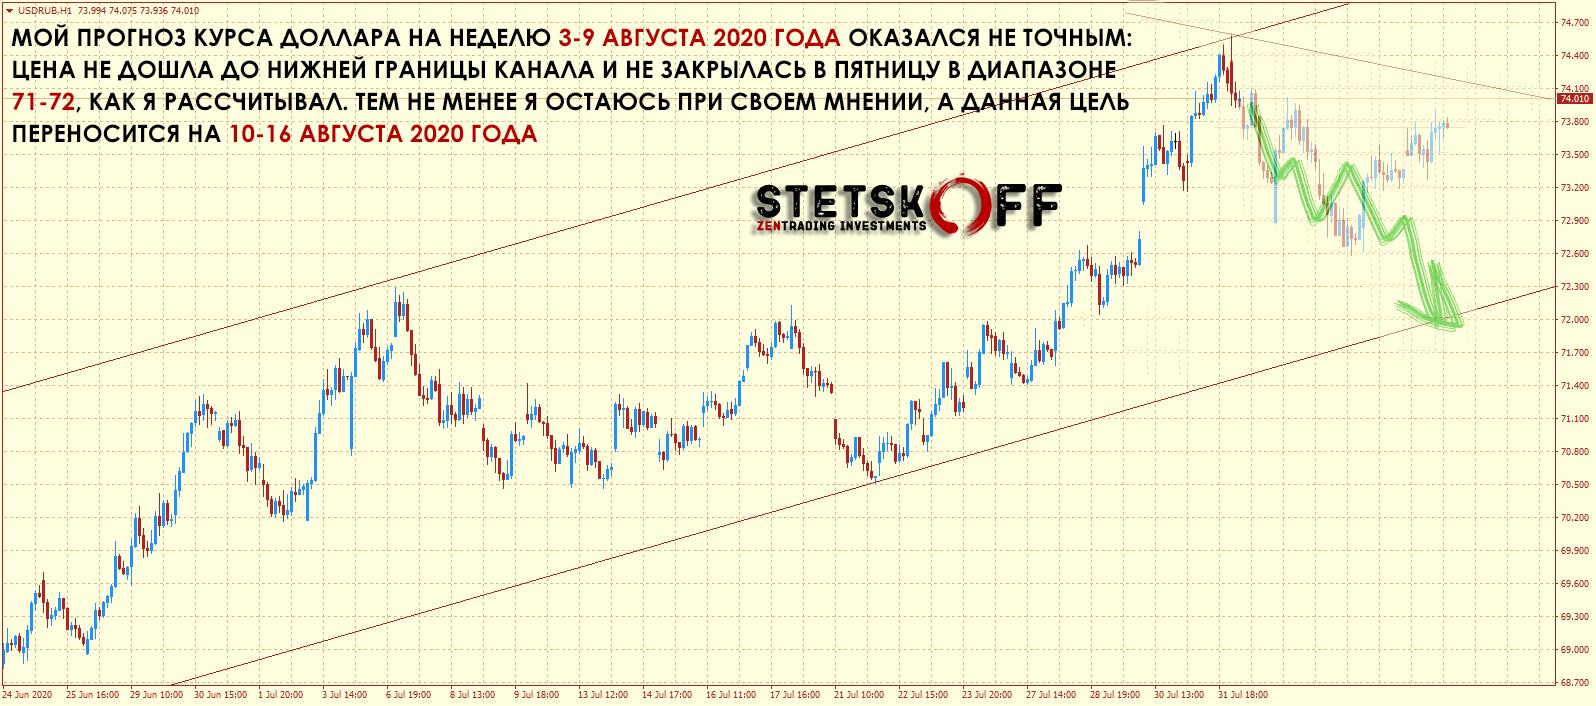 прогноз курса доллара США к рублю на неделю 10-16 августа 2020 1